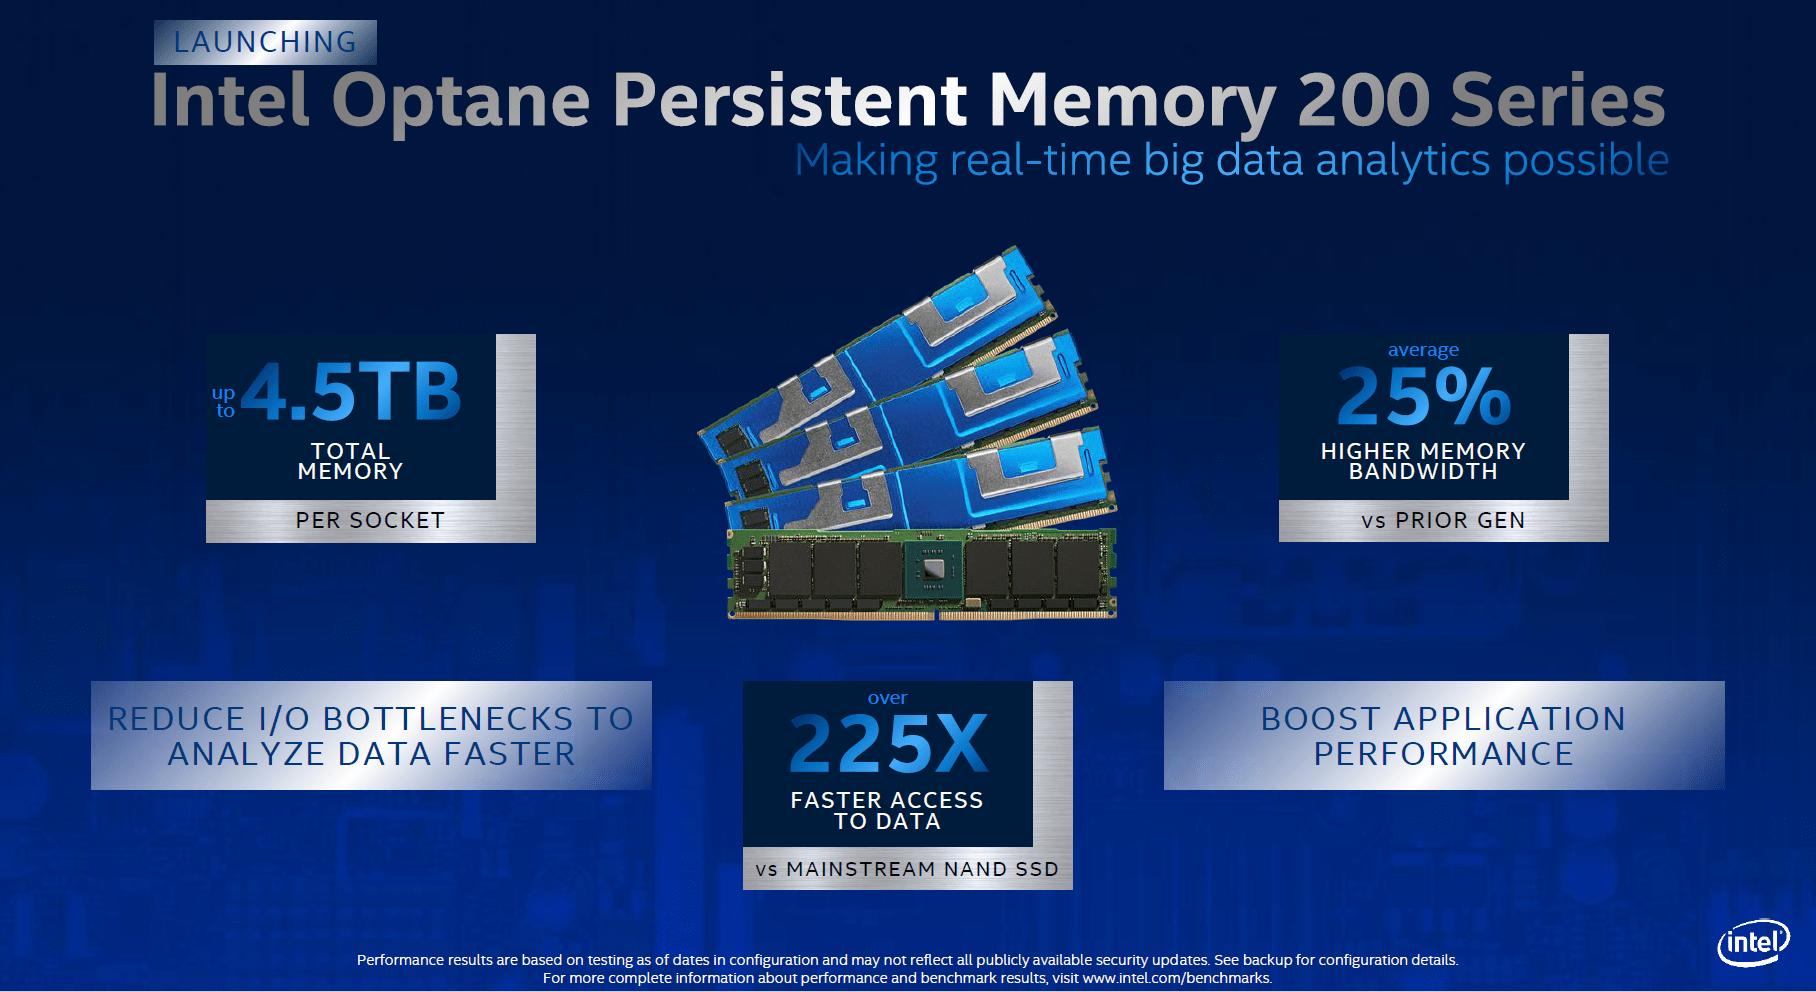 Intel Optane PMem 200 series